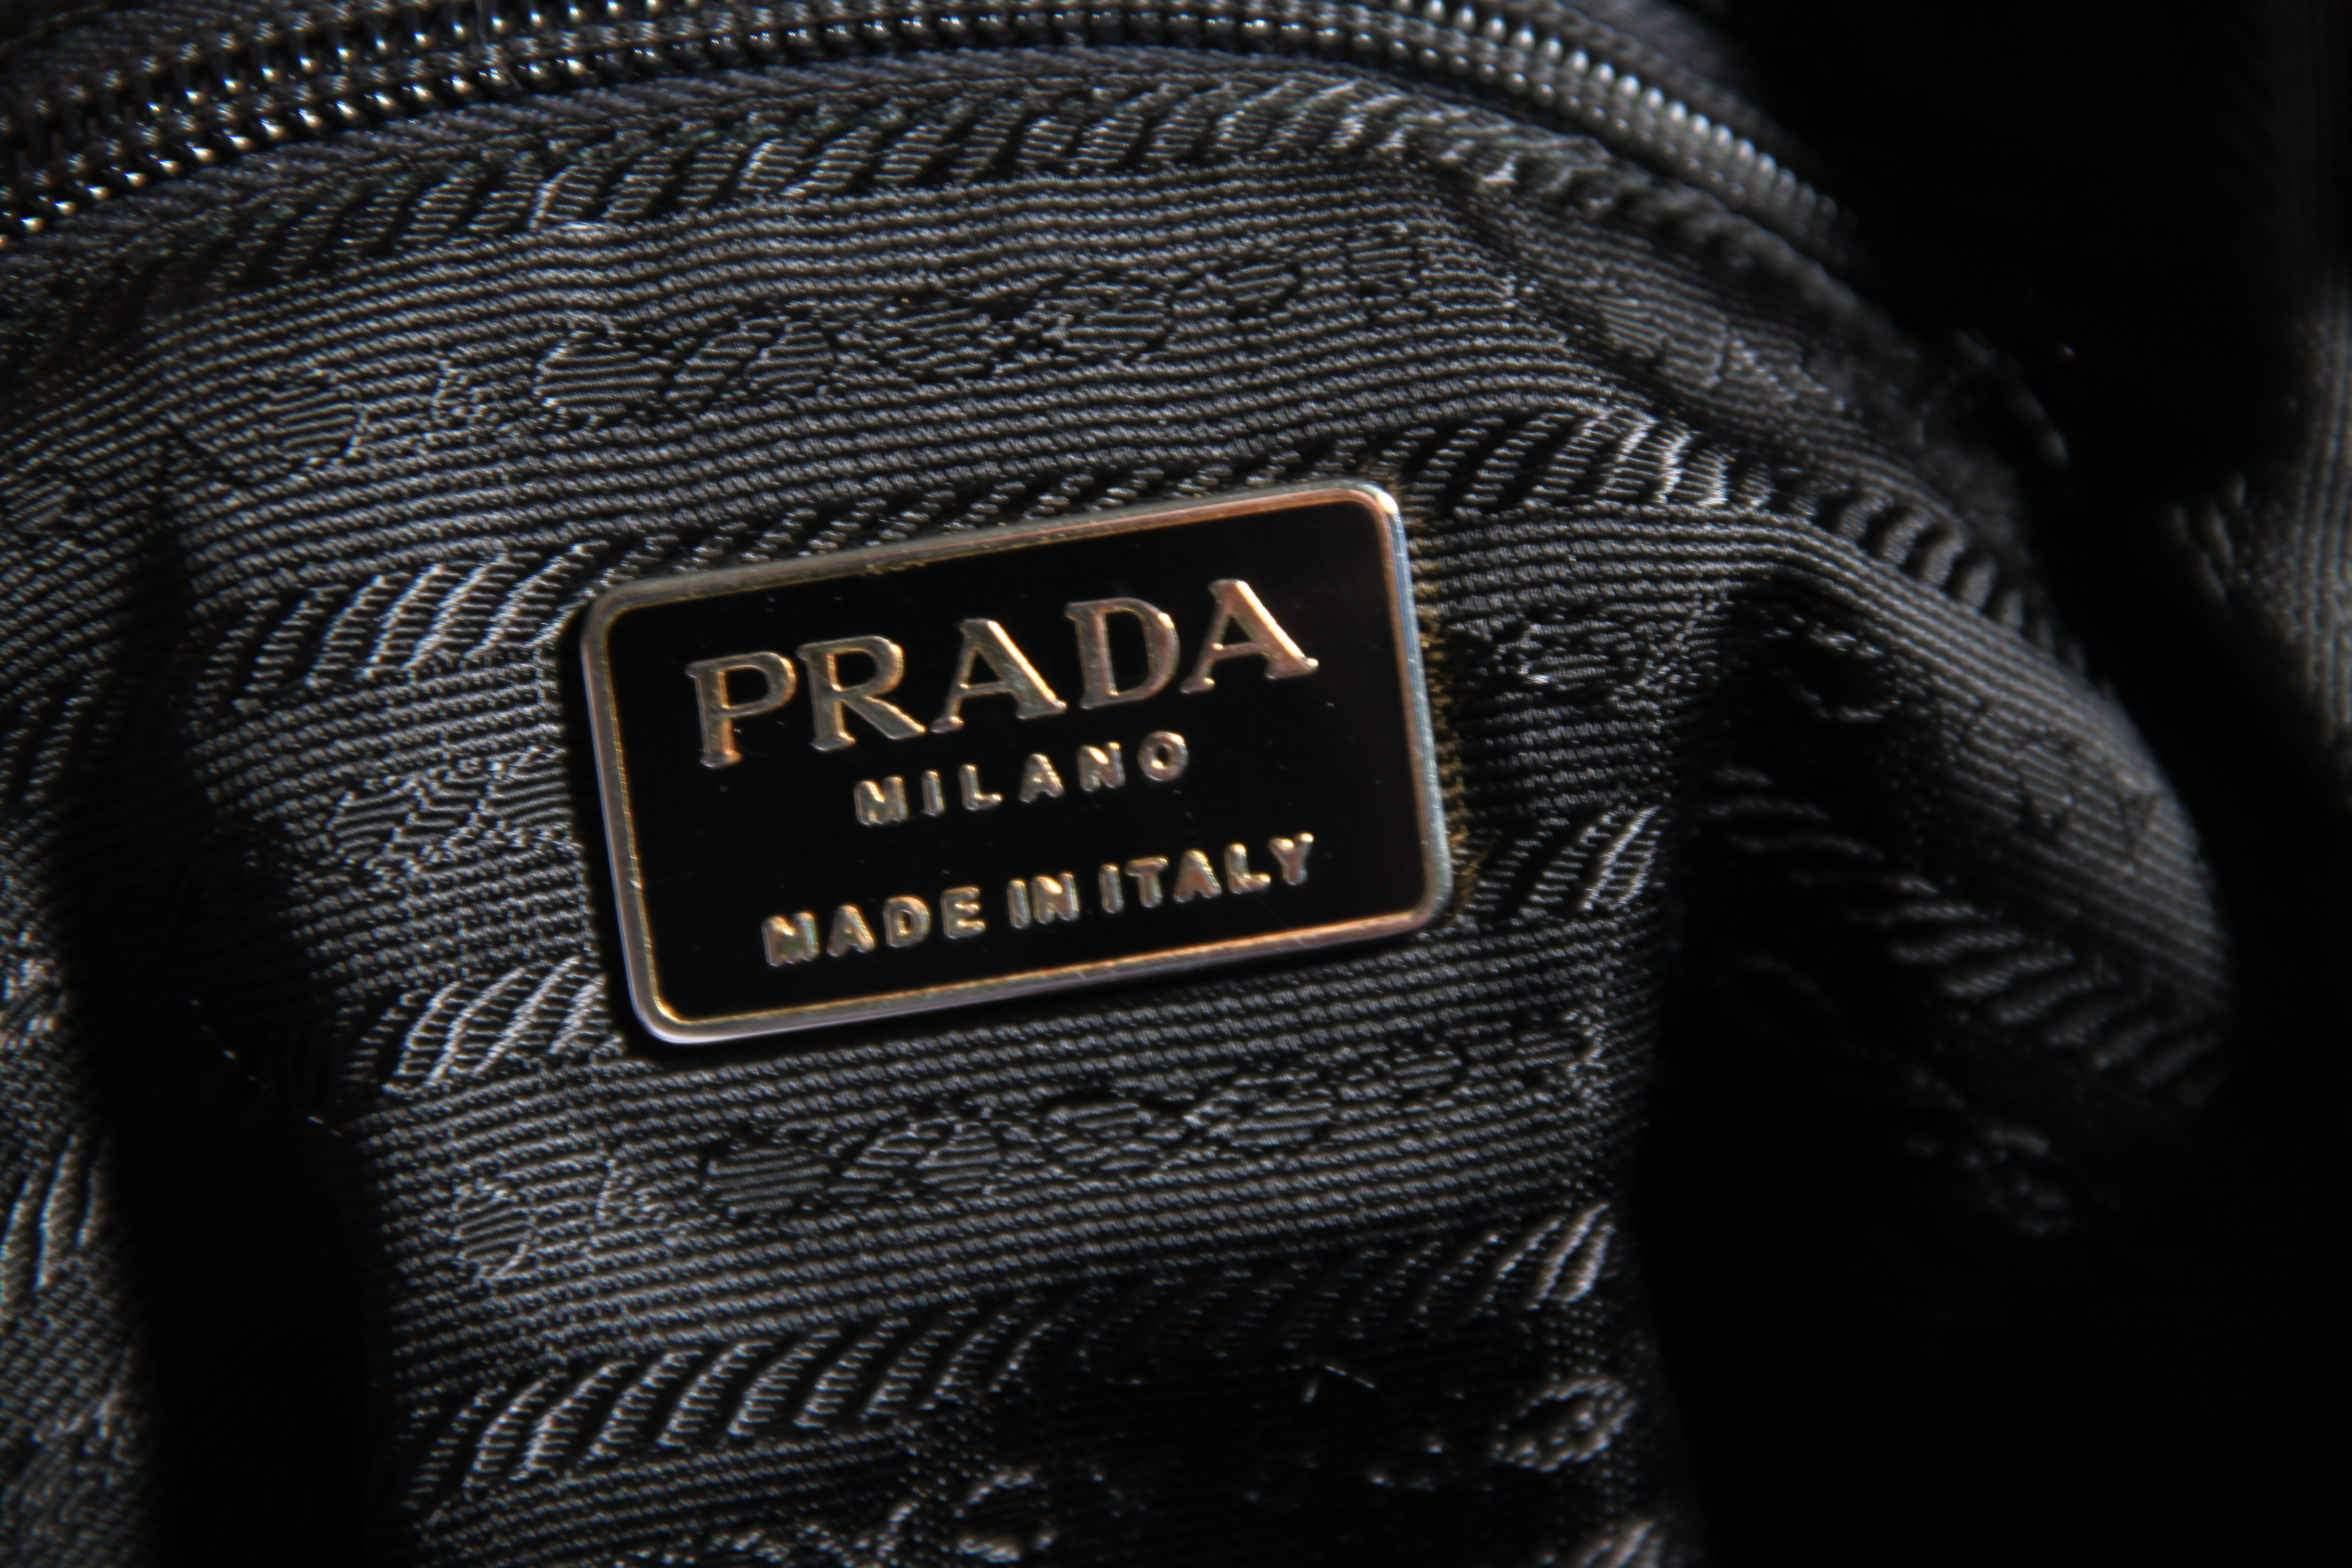 7dce150b2f3f26 Prada: logos, shapes and details , a close look - VintageMania